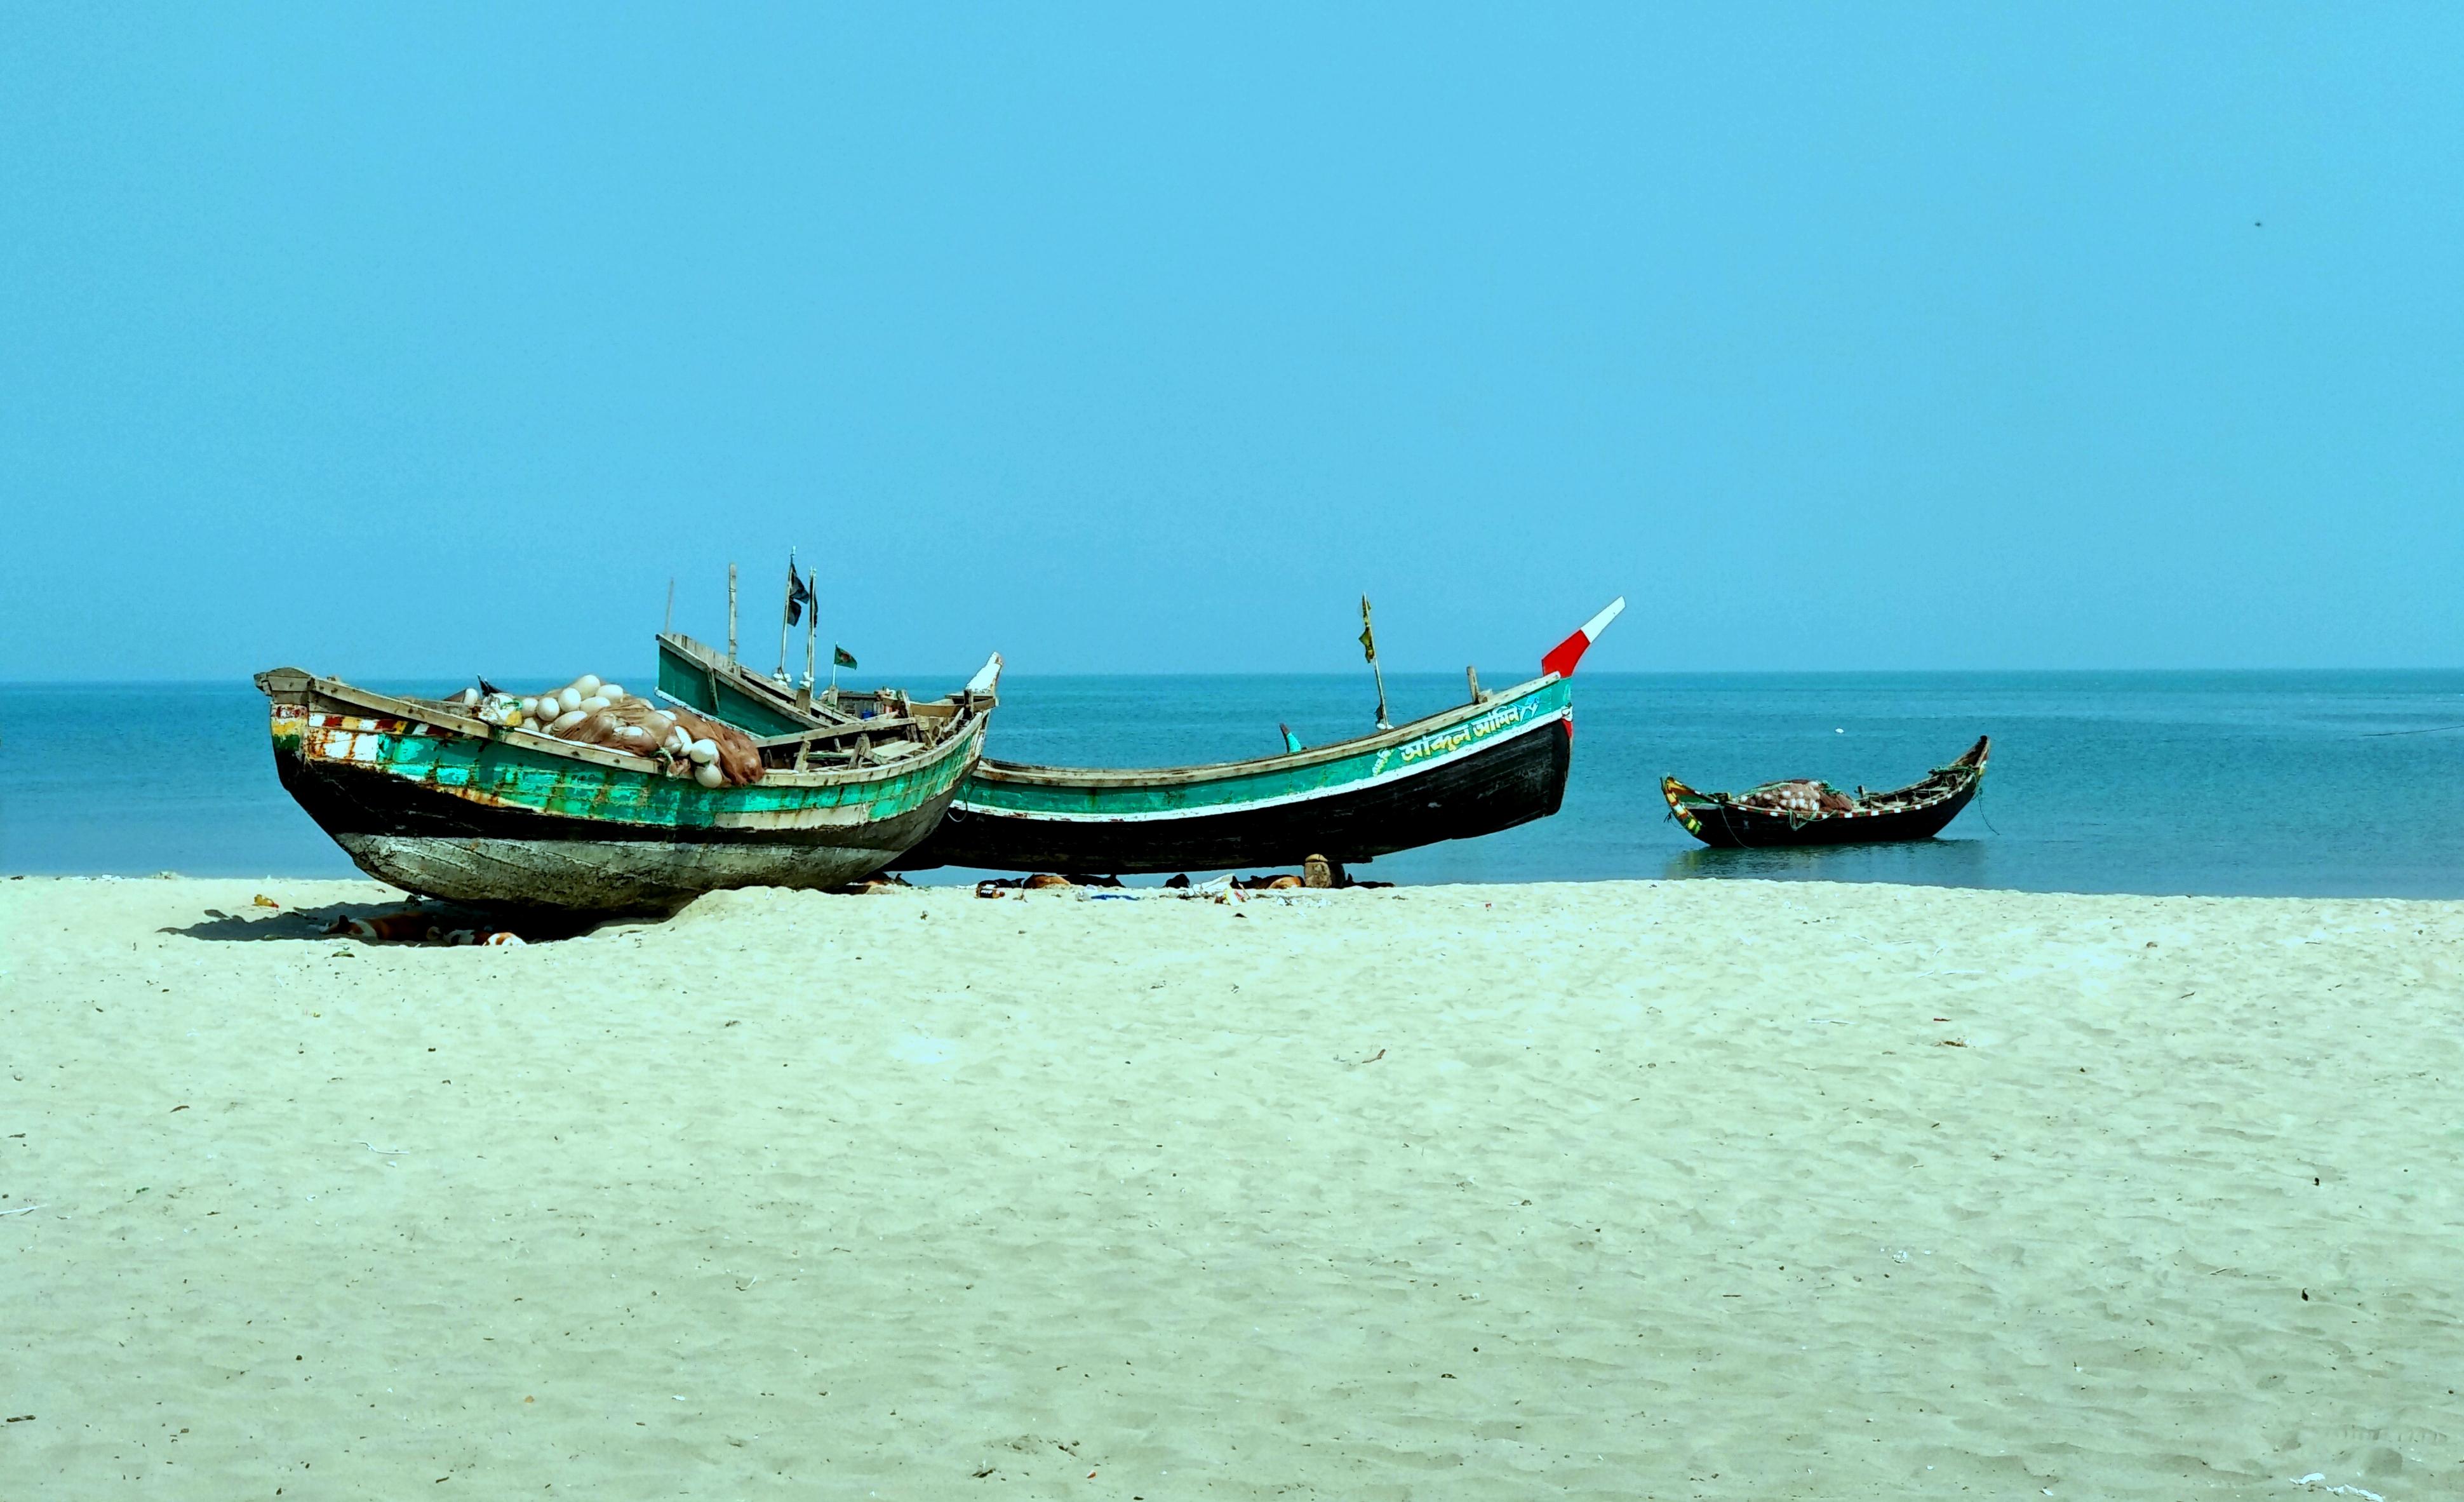 Fishing Boat, Saint Martin's Island, Teknaf, Cox's Bazar, Afternoon, Sea, Ocean, Photography, HQ Photo